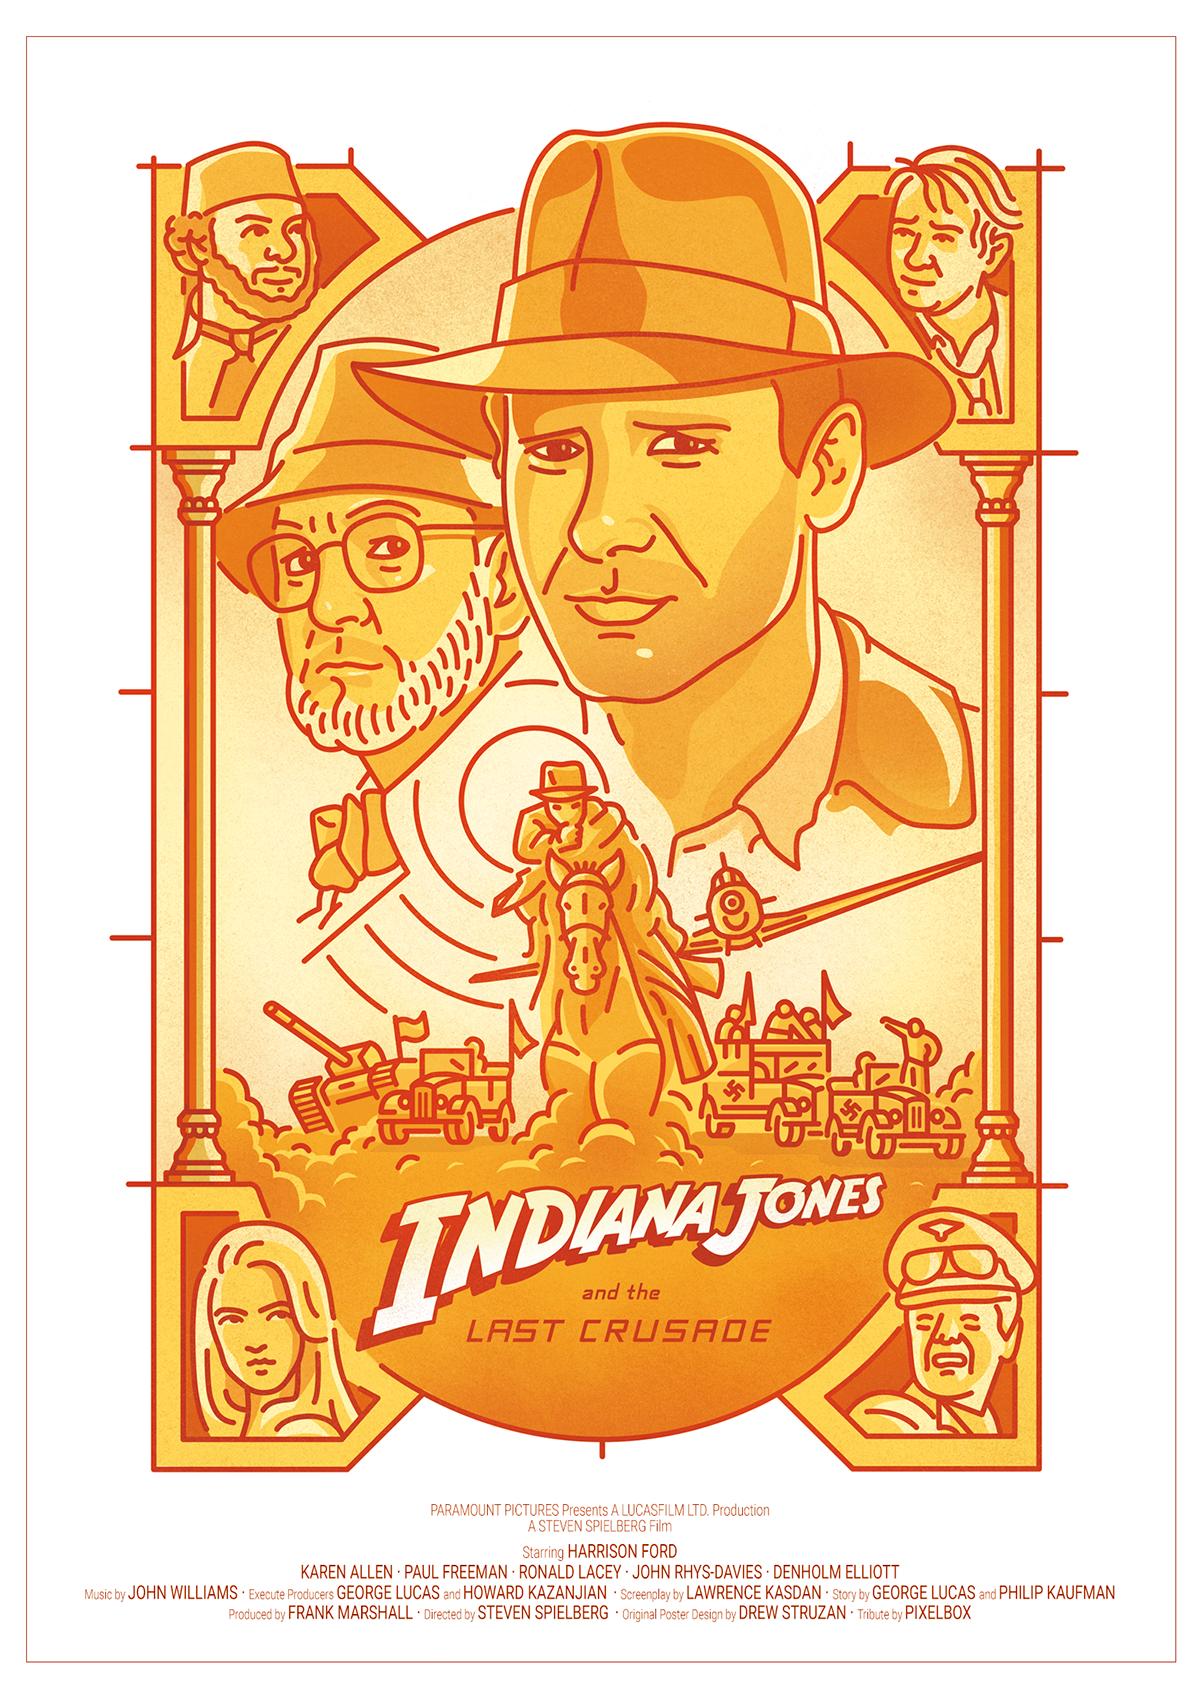 indiana jones indy Drew Struzan trilogy movie poster carteles Lost Ark Harrison Ford last crusade doom